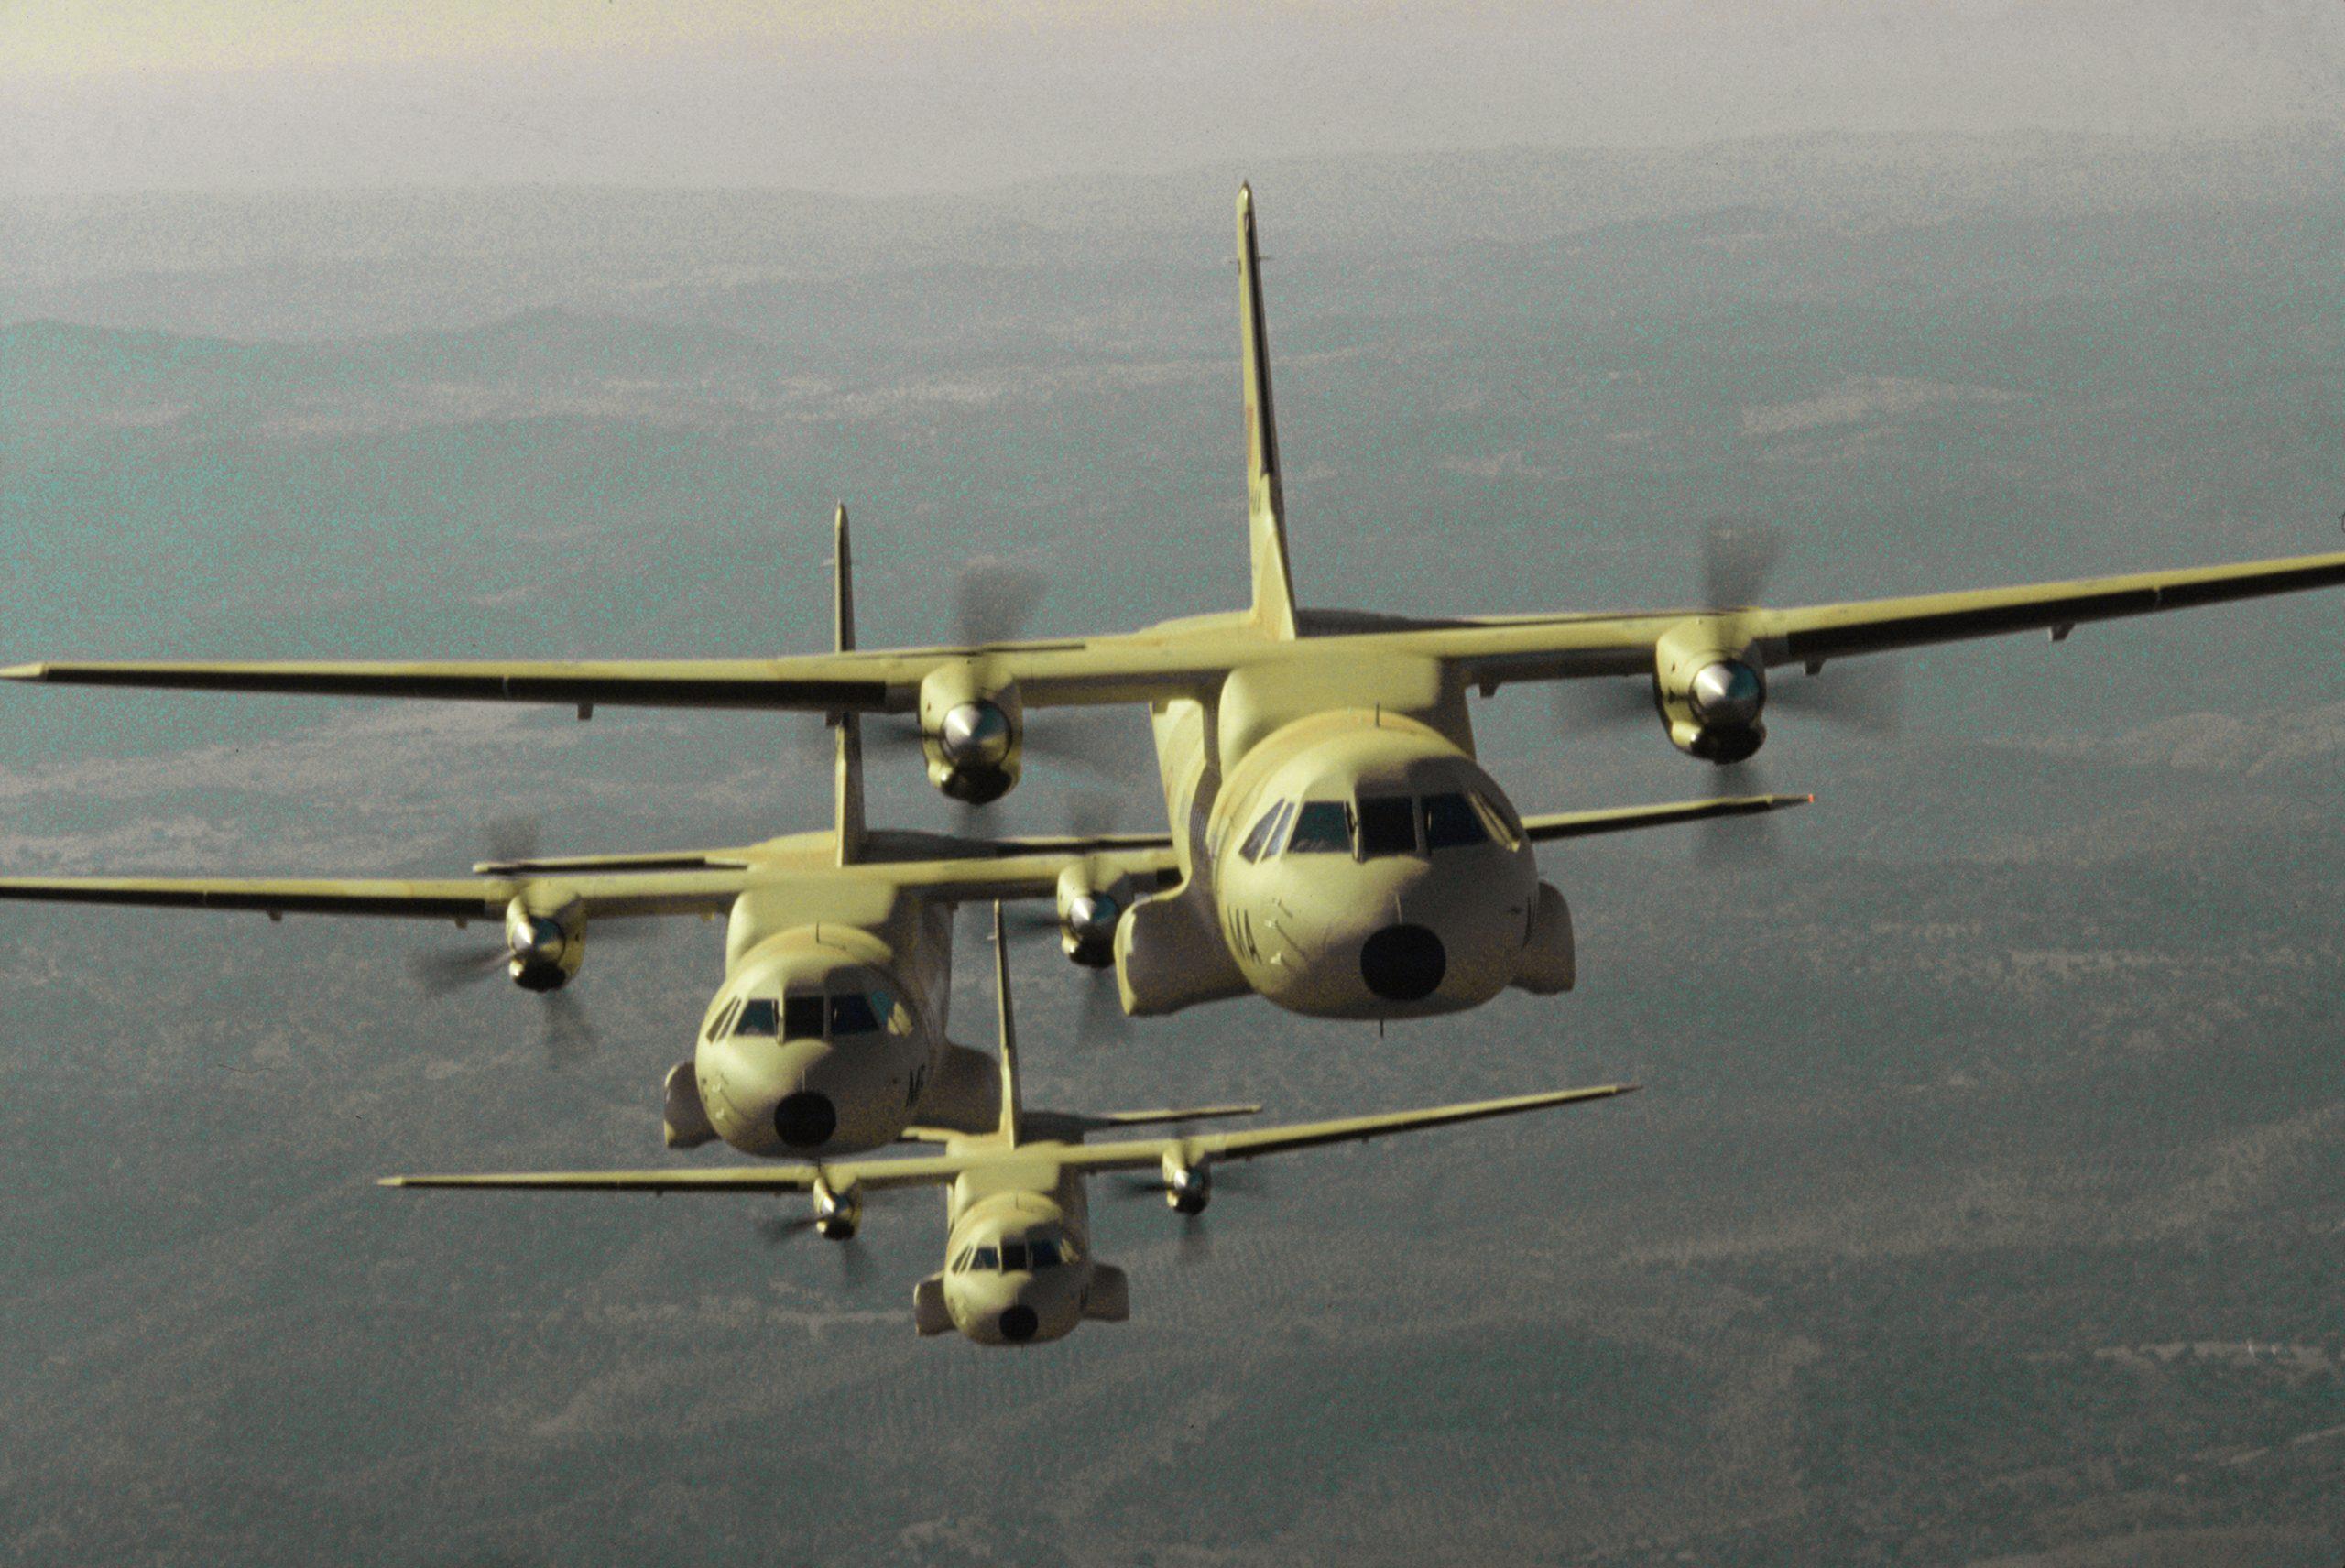 CN235-Moroccan-Air-Force89662.jpg